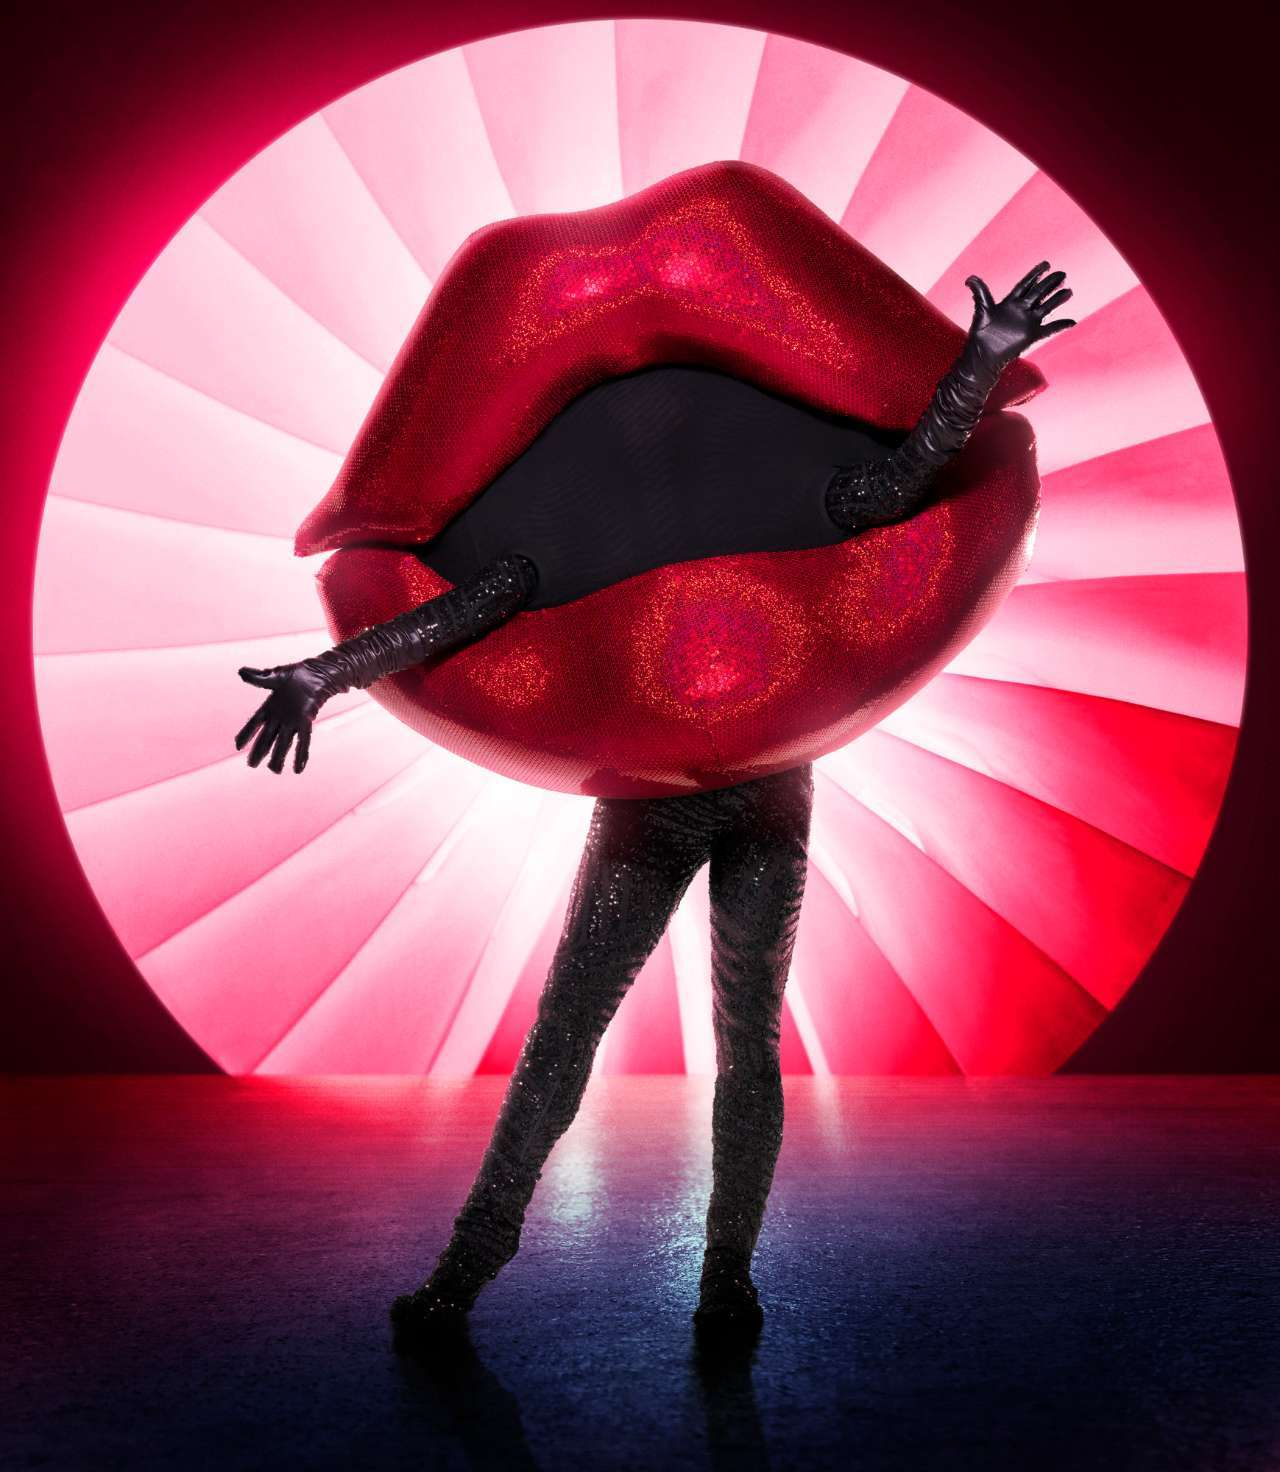 the-masked-singer-lips-20093994.jpeg?auto=webp%26width=1280%26height=1472%26crop=1280:1472,smart&f=1&nofb=1